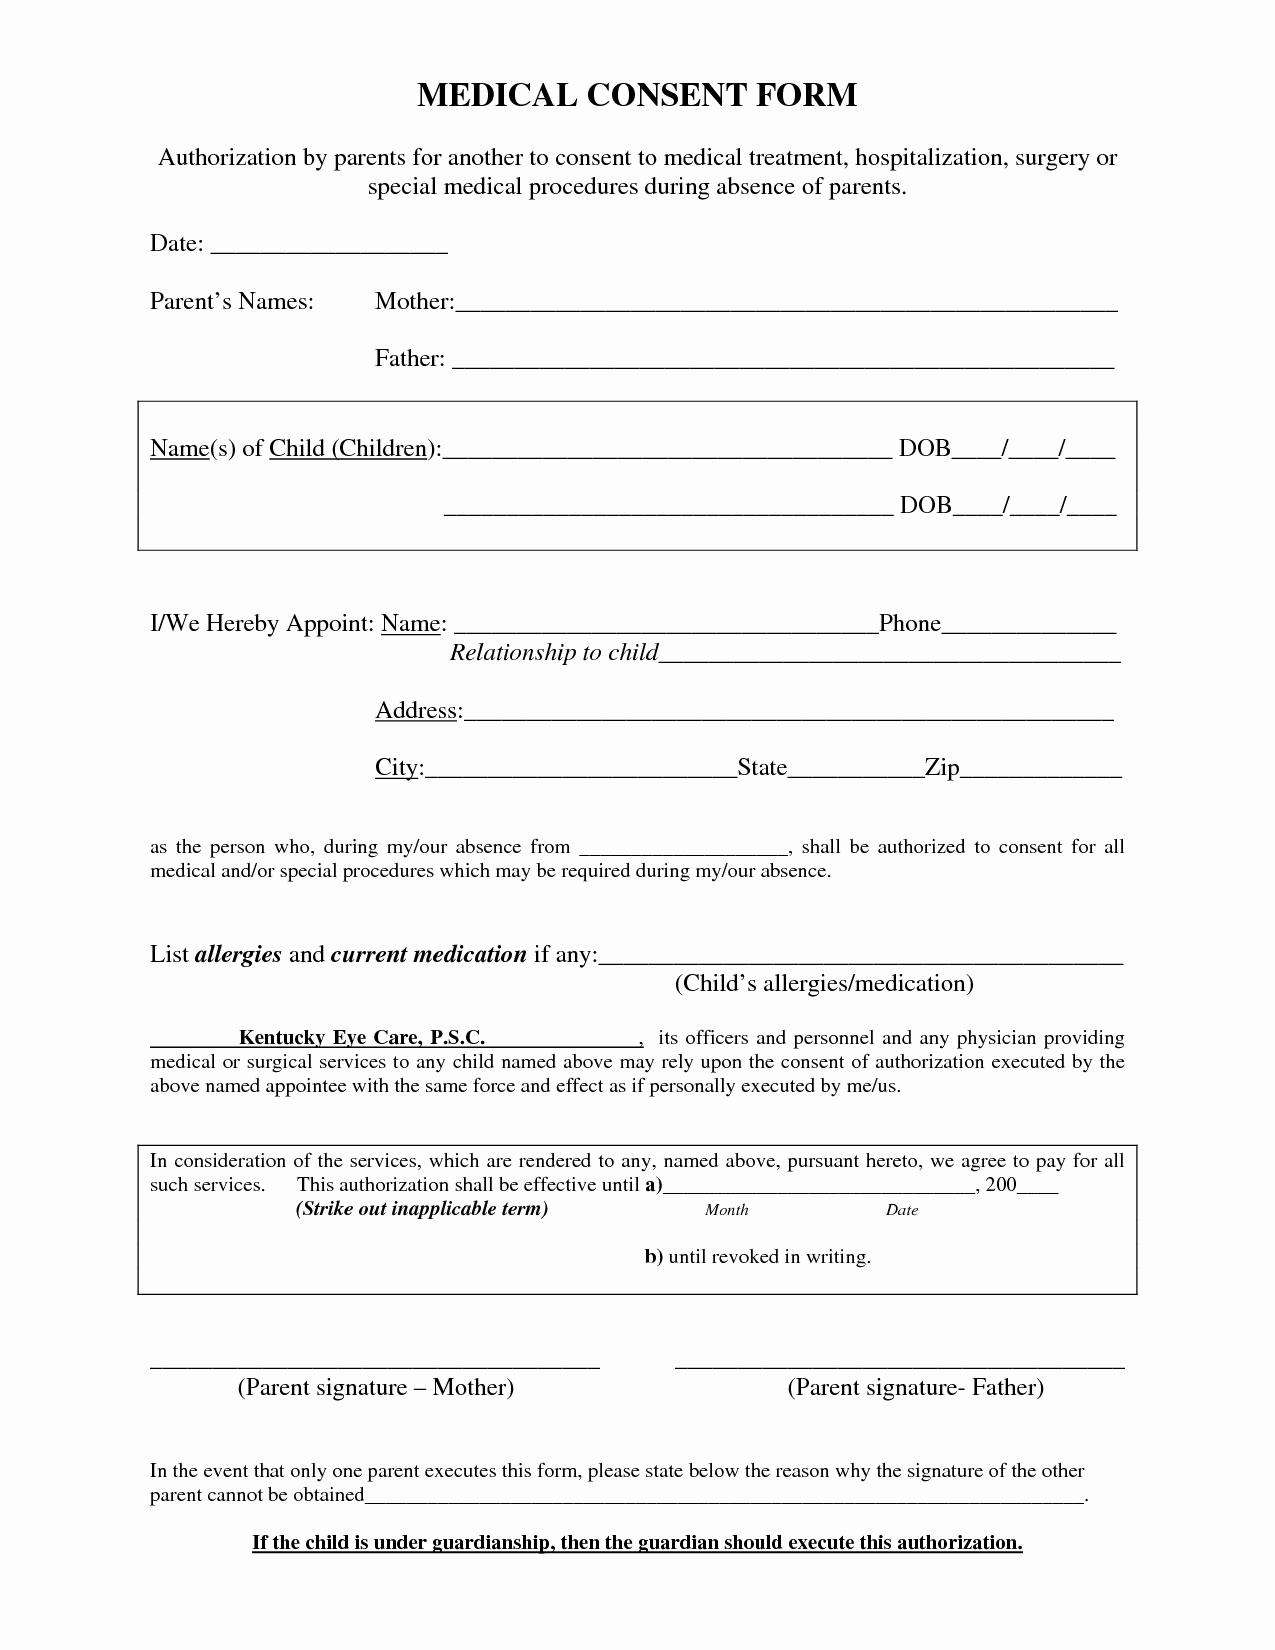 Medical Procedure Consent form Template Awesome Medical Procedure Consent form Template